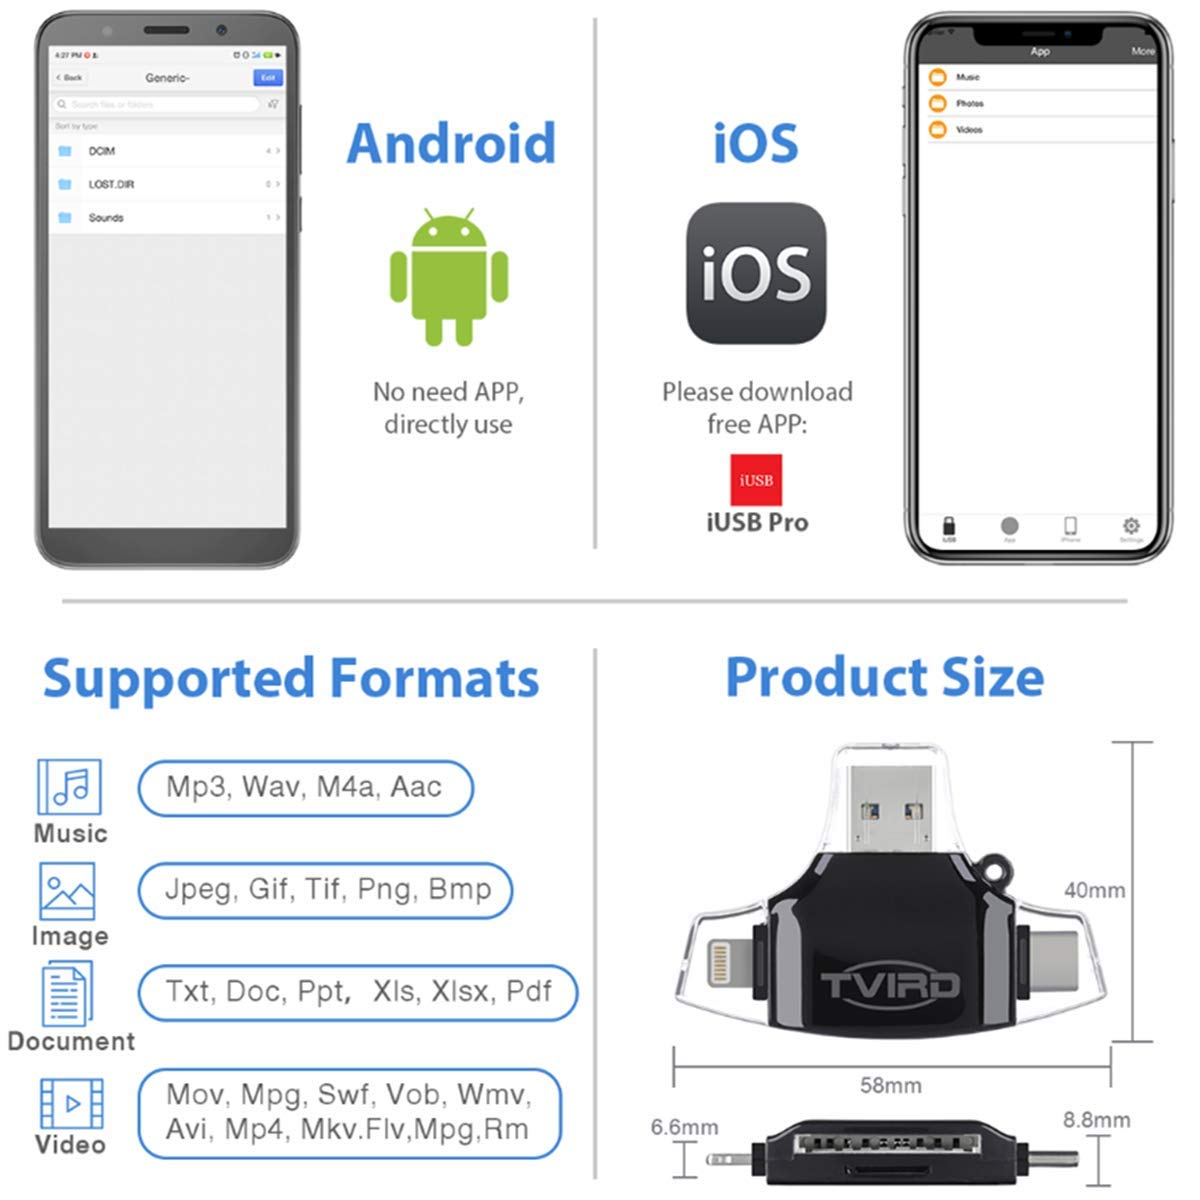 Tvird Kartenleser,Micro SD /& TF Speicherkartenleser 4 in 1 Kartenleseger/ät L.ightning//USB-Typ-C//USB//Micro-USB,Adapter Micro SD Karte OTG Funktion Card Reader Adapter f/ür iOS//Android//PC